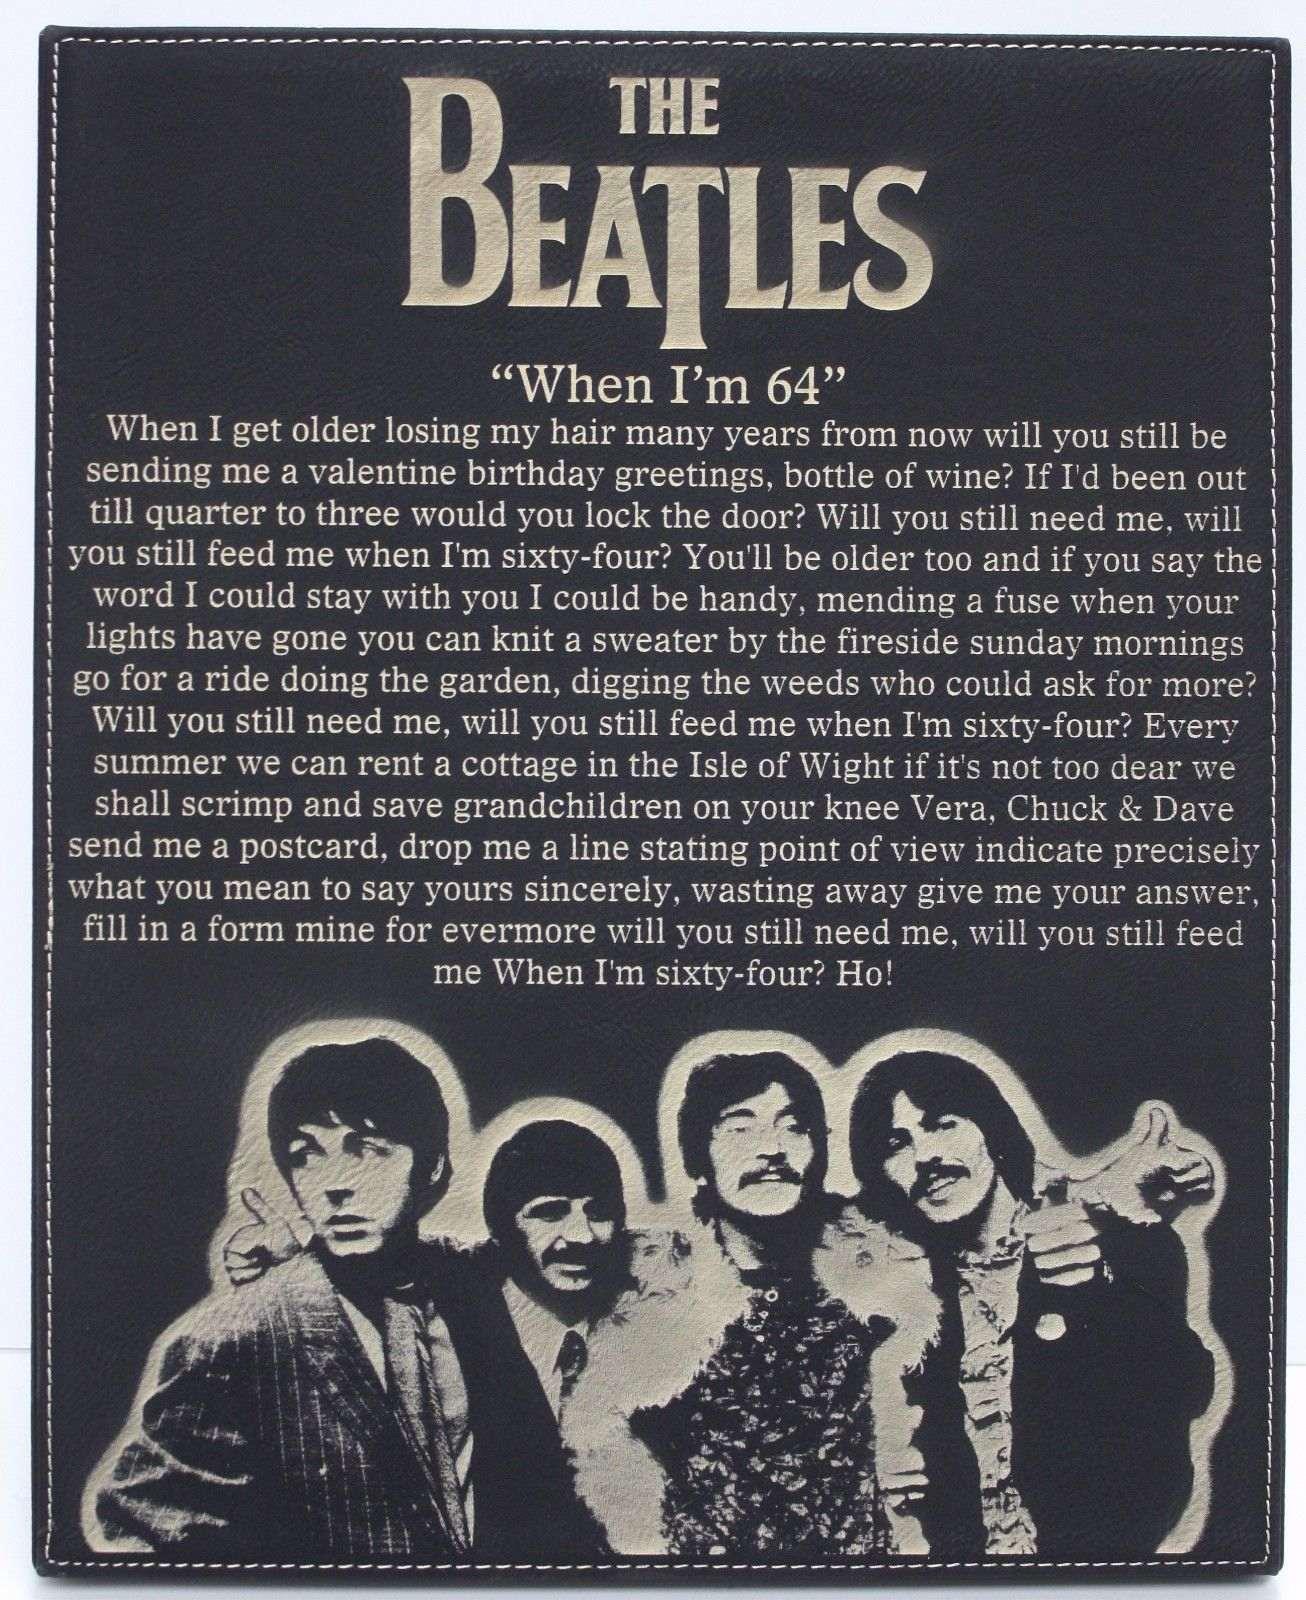 Beatles When I M 64 Laser Etched Lyrics Band Art Black Leatherette Plaque C3 Gold Record Outlet Album And Disc Collectible Memorabilia